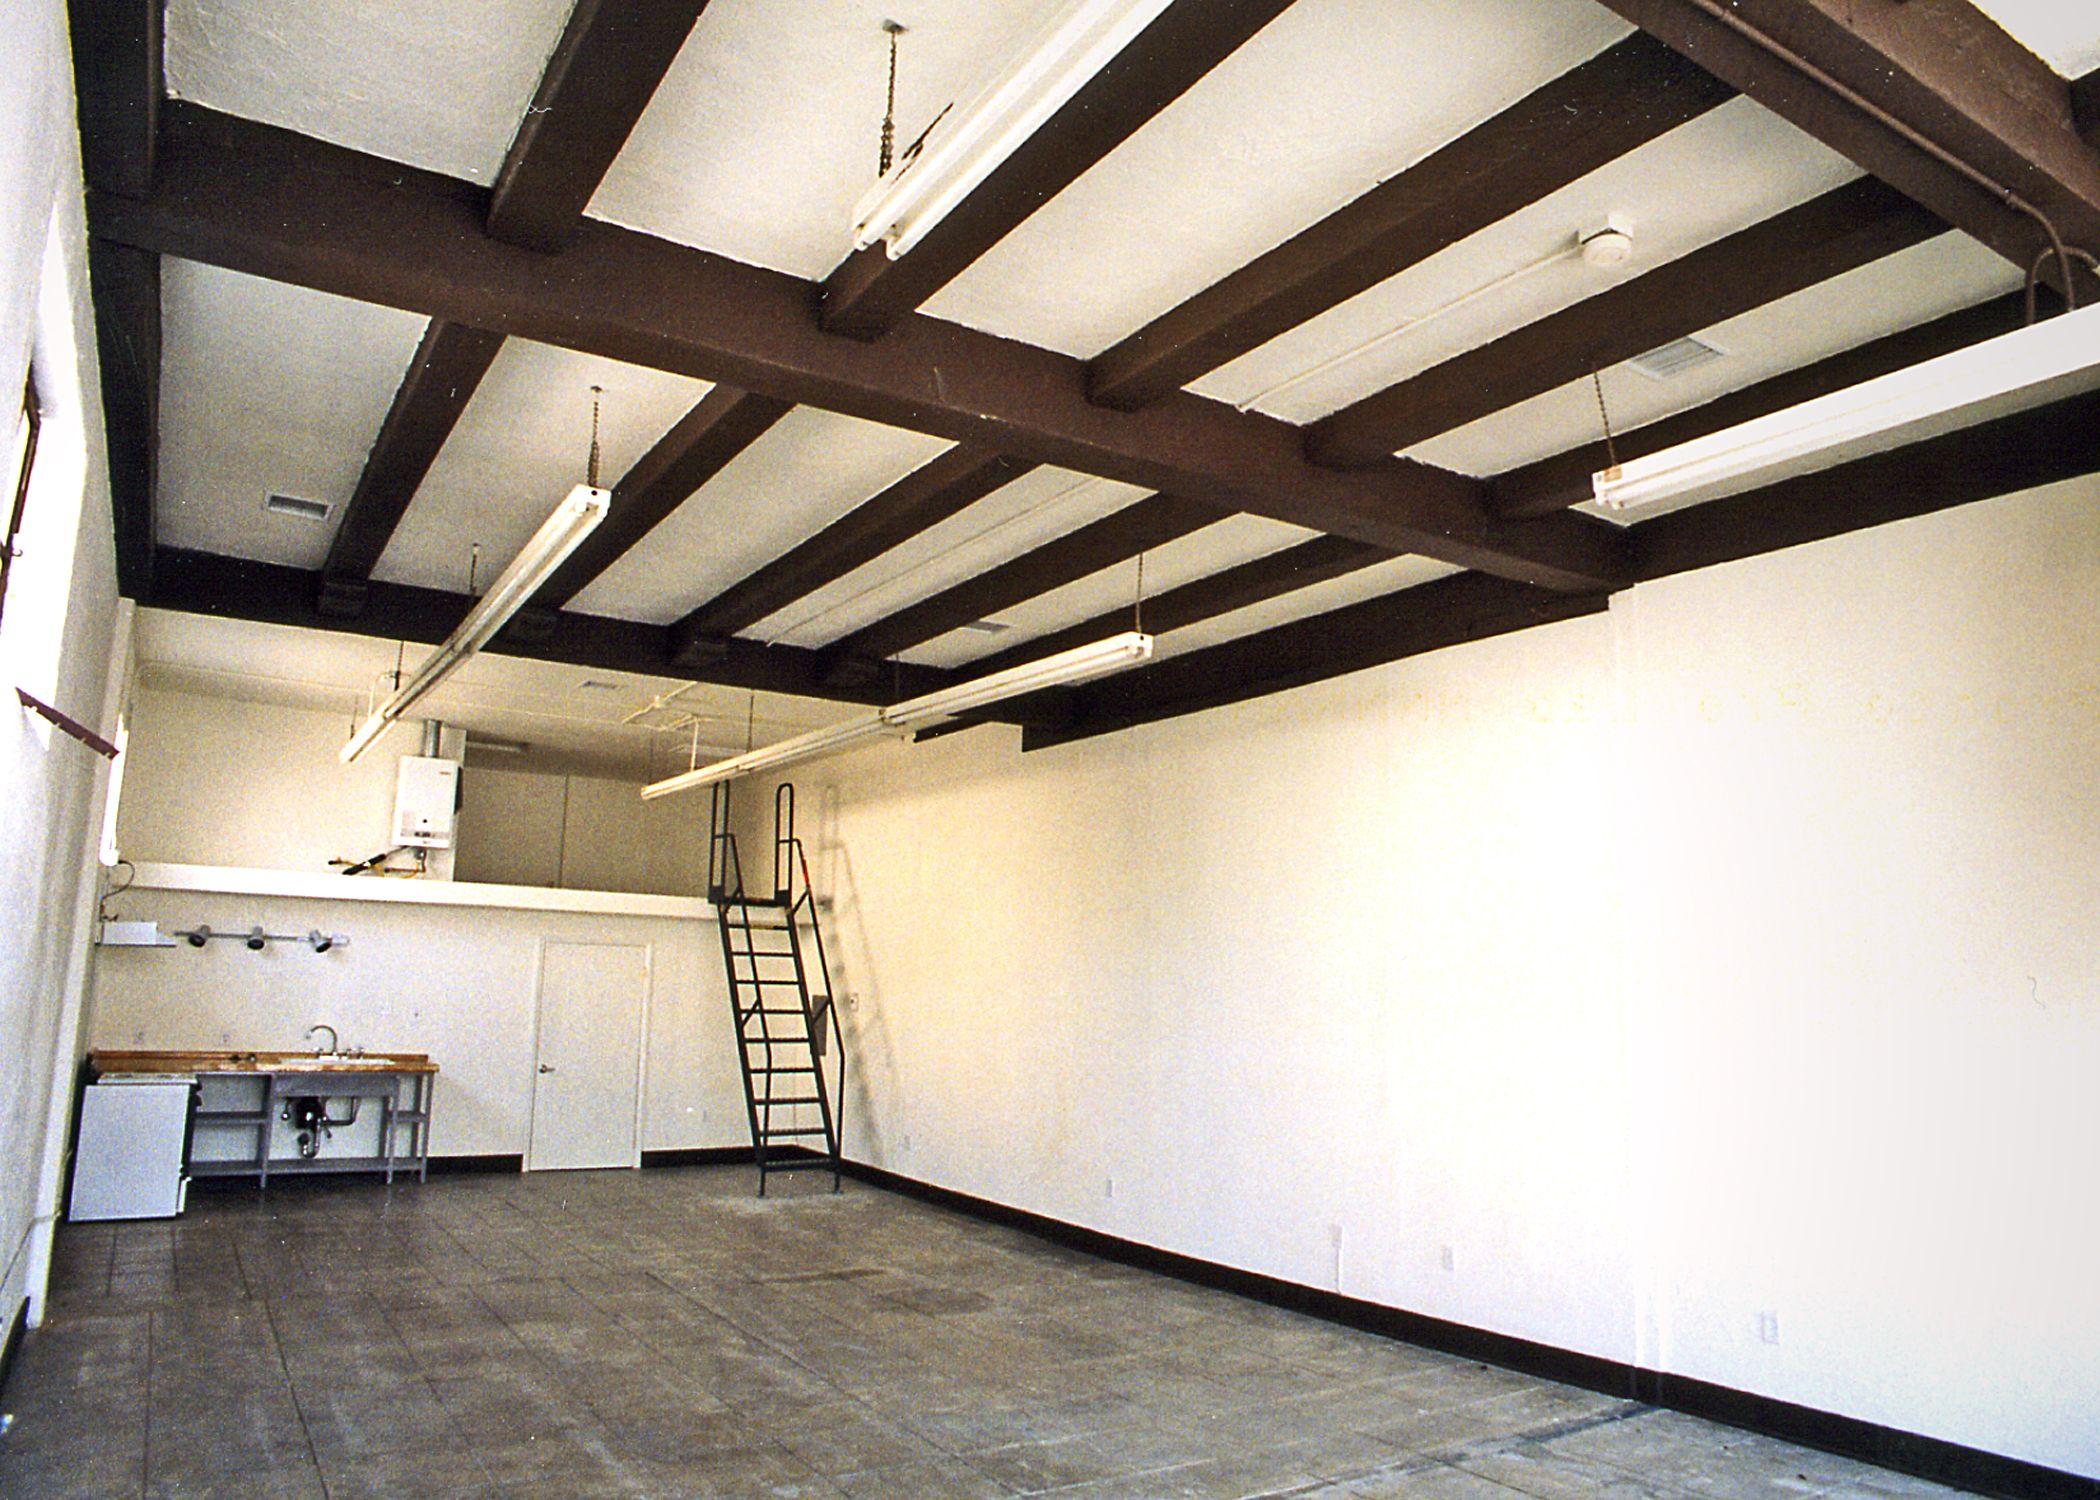 Ontario Arts Lofts Loft Style Apartments Loft Style Diy Small Apartment